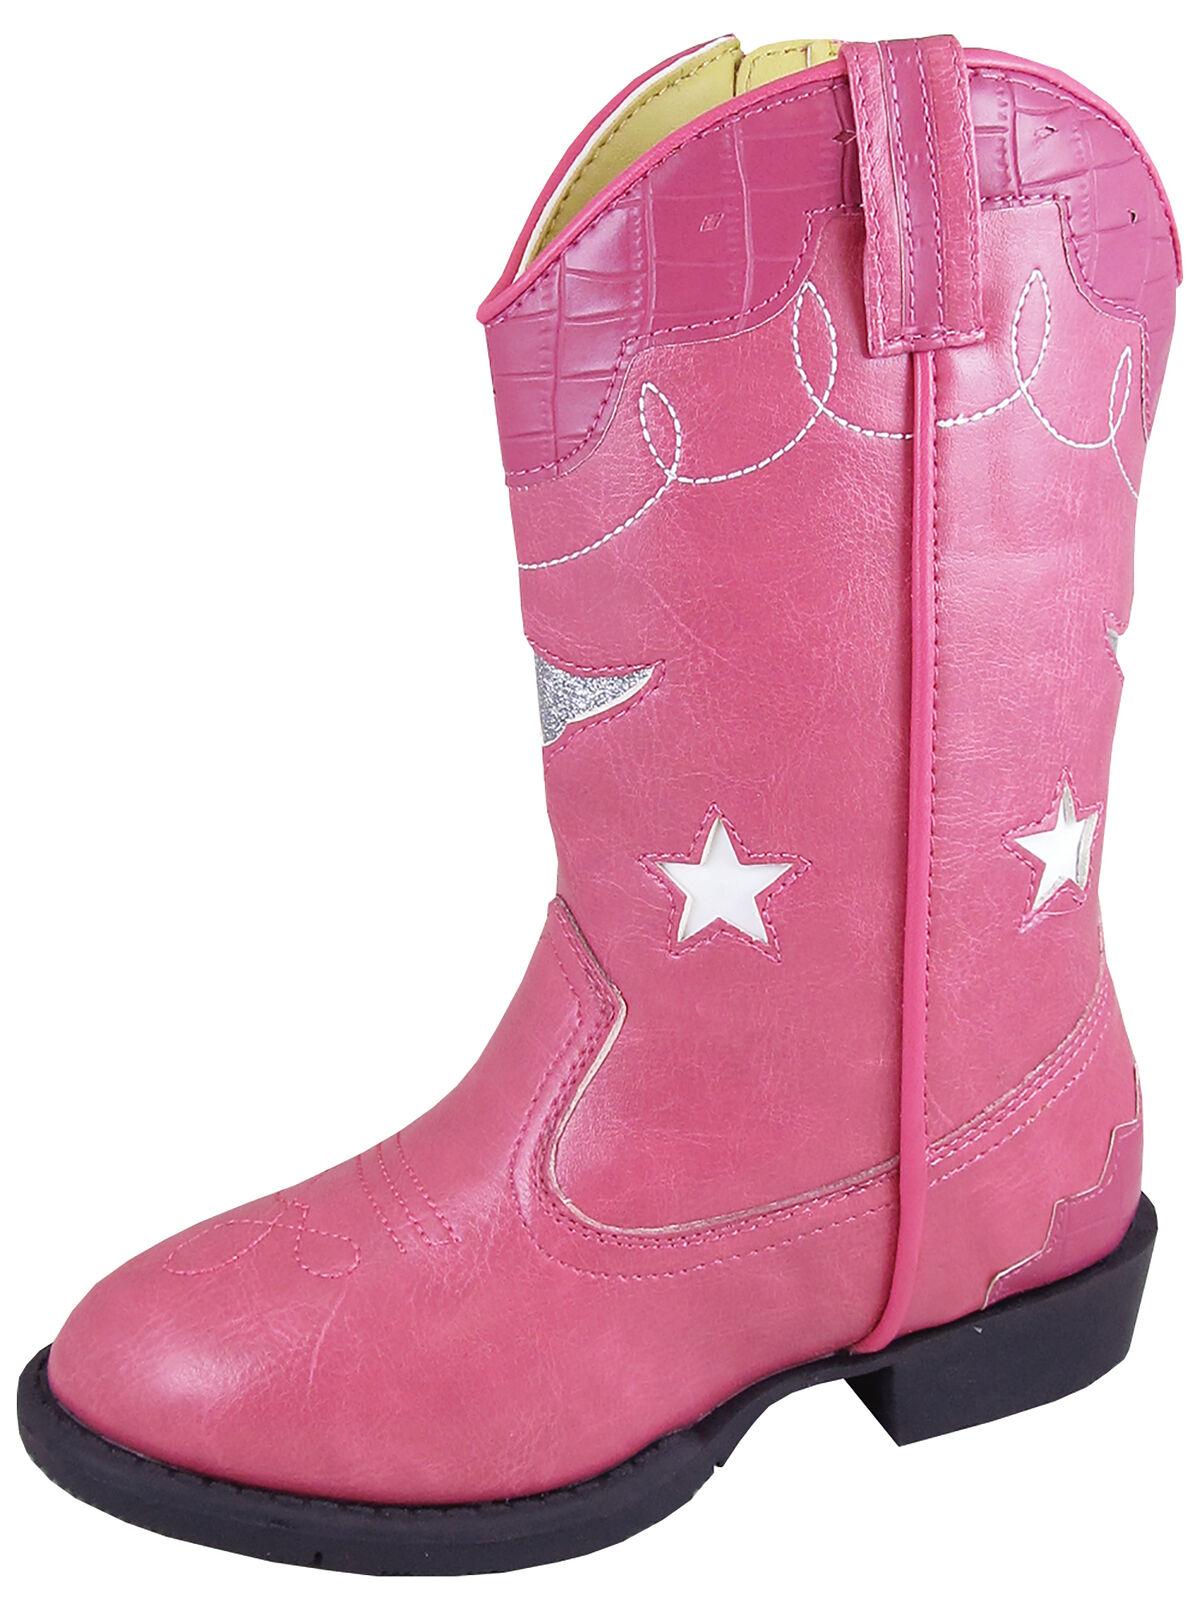 Smoky Mountain Kids Girl Austin Lights Western Cowboy Boots Leather Stars Pink